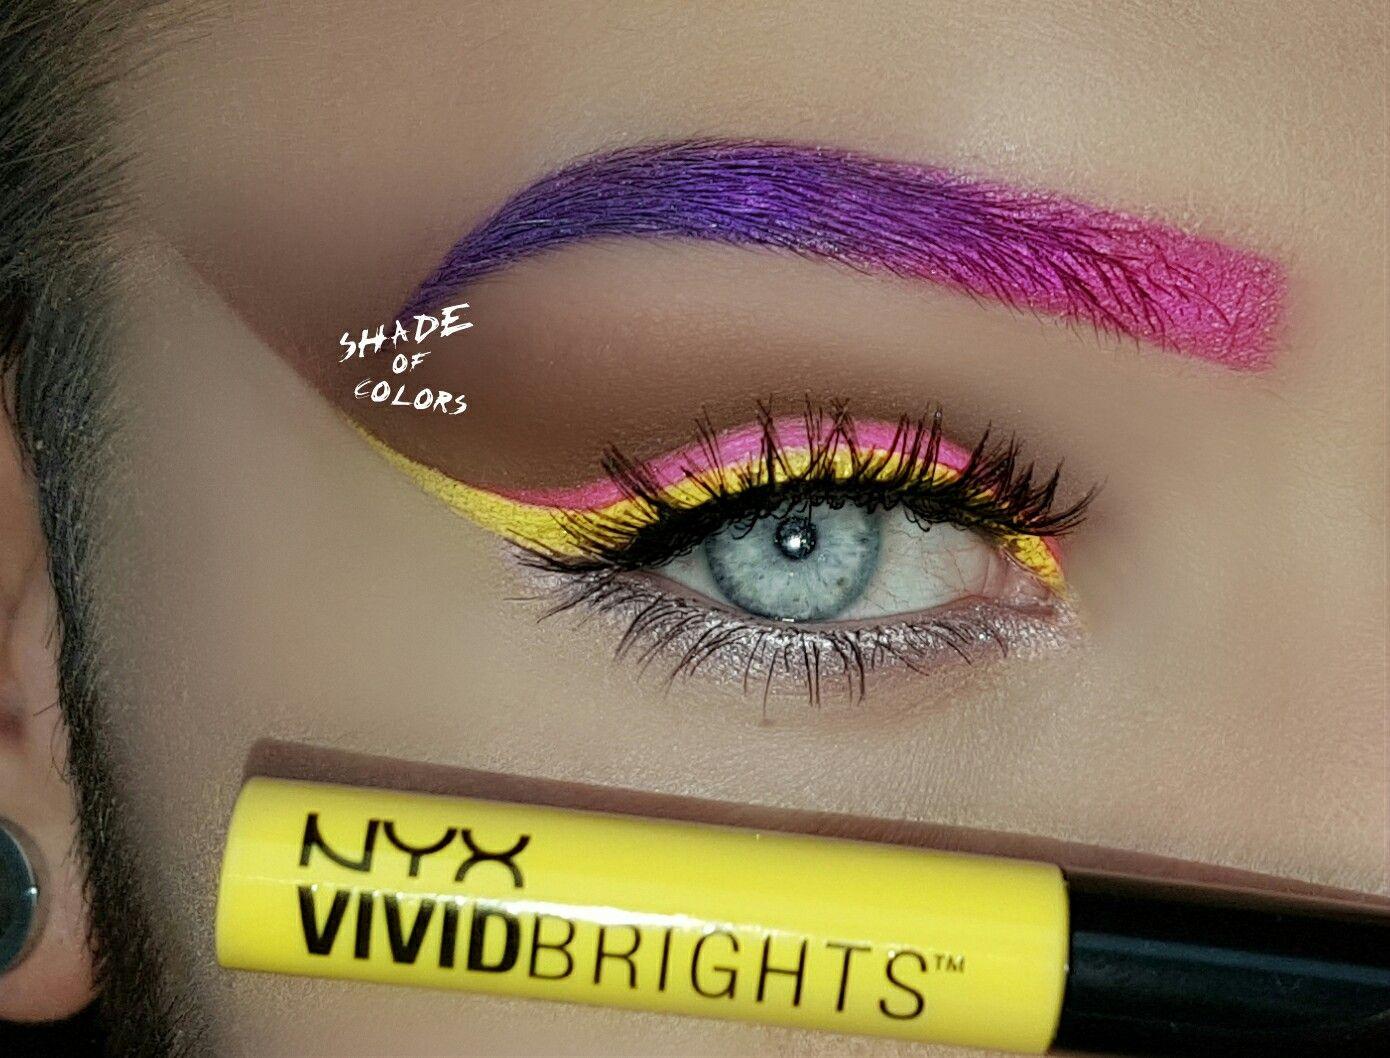 #glitter #unicorn #makeup #passion #kyliejenner #kimkardasian #fun #diy #deco #fashion #outlet #mac #apple #samsung #mufe #kiko #NYX #nyxcosmeticsbelgium #nyxcosmeticsnamur #love #f4f #l4l #twitter #trend #nyxcosmeticsnamur #nyxcosmeticsbelgium #highlighter #nyx #nyxcosmeticsnamur #nyxstrobeofgeniuspalette #LIGHT #makeup #skinfrost #nyxlingerie #nyxmakeup #nyxfan #kyliejenner #kimkardasian #eyes #hudabeauty #maclipstick #vivaglam #VICTORIASECRET #mystery #sephora #glam #gold #VICTORIASECRET